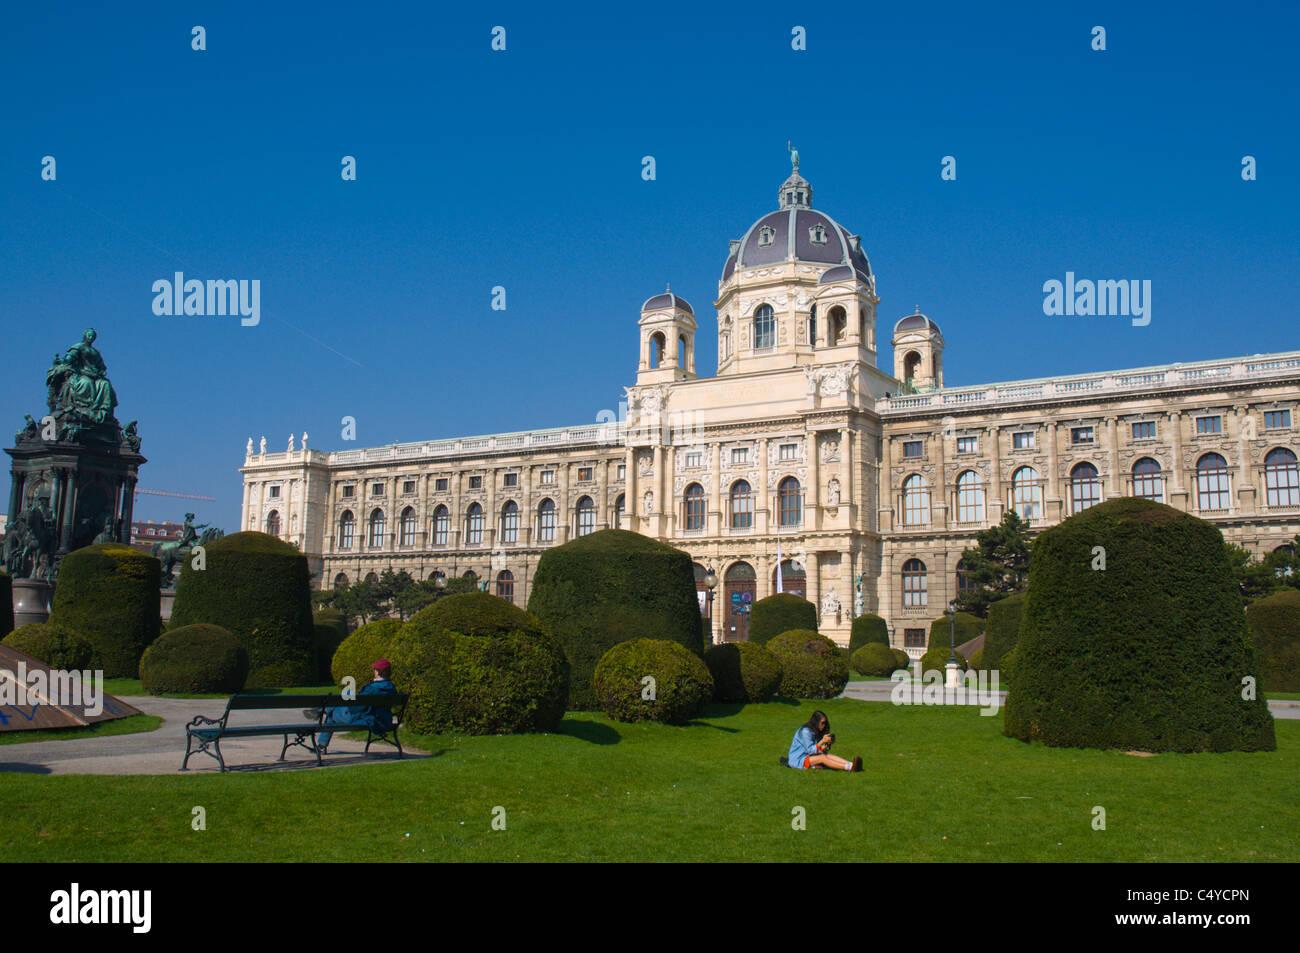 Naturhistorisches Museum exterior at Maria-Theresien-Platz square Innere Stadt central Vienna Austria central Europe - Stock Image